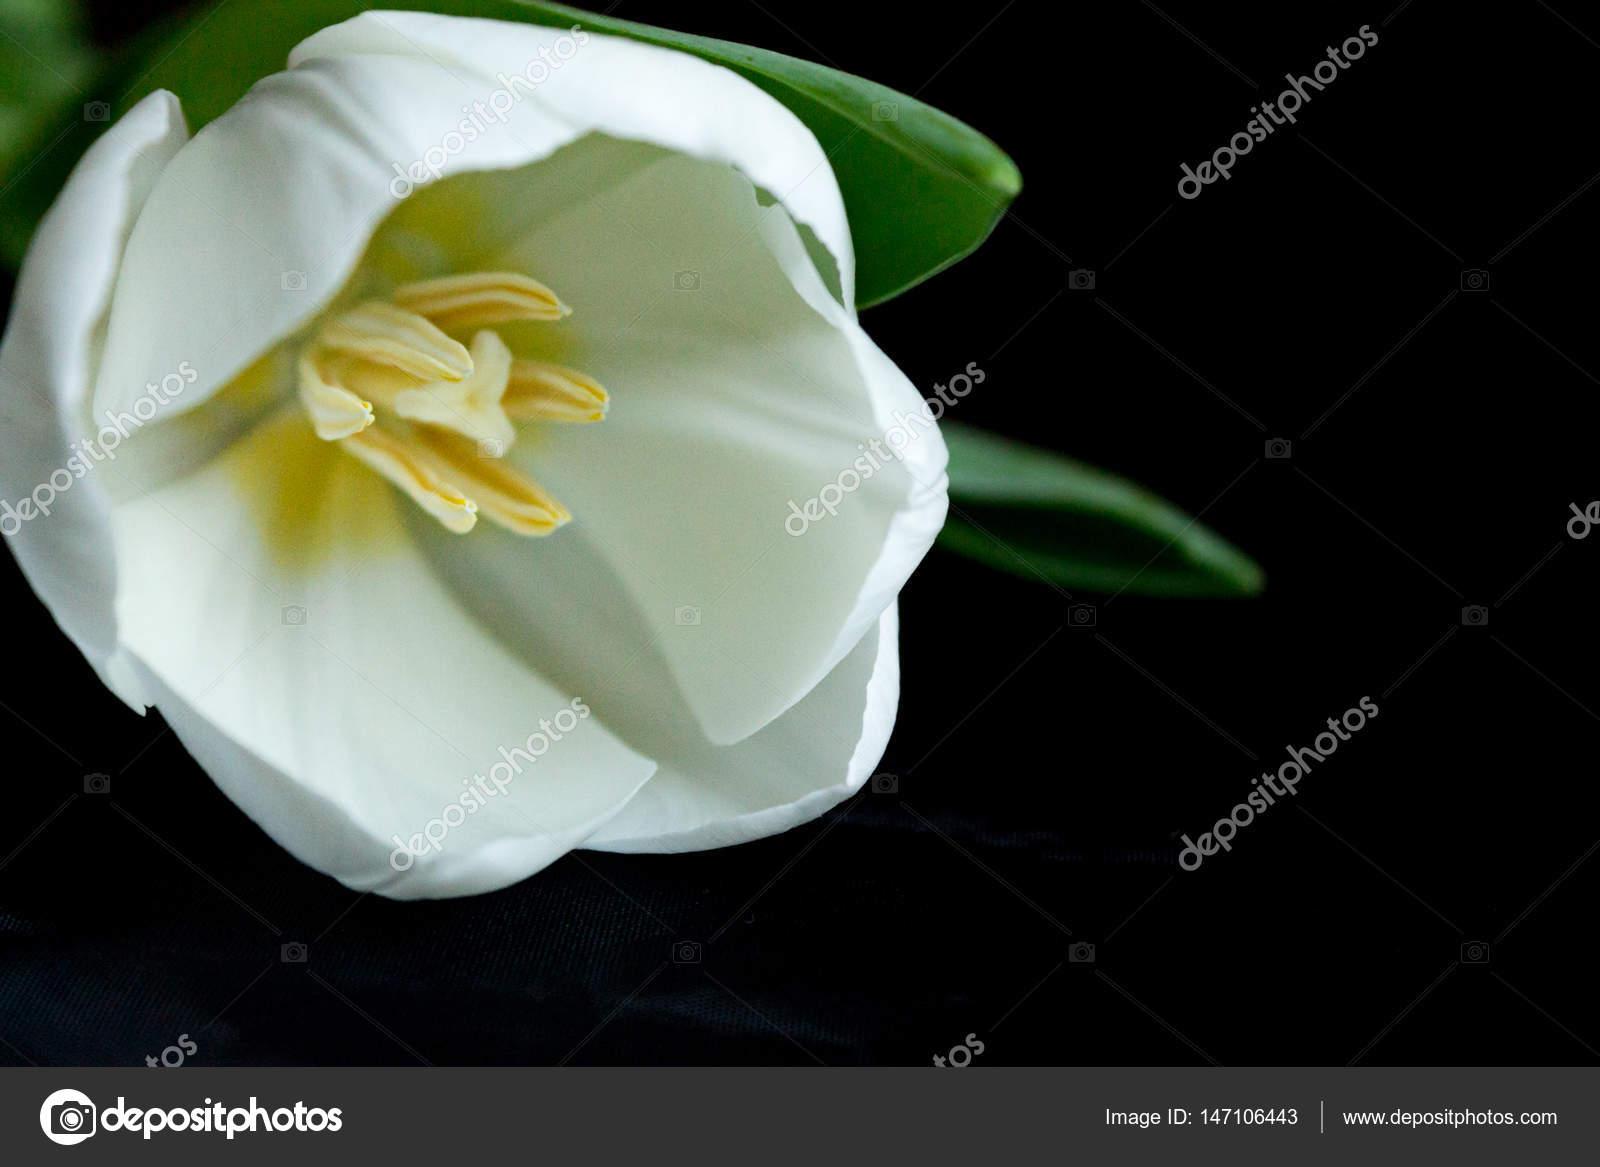 One white flower on a black background stock photo haurashkoksu one white flower on a black background stock photo mightylinksfo